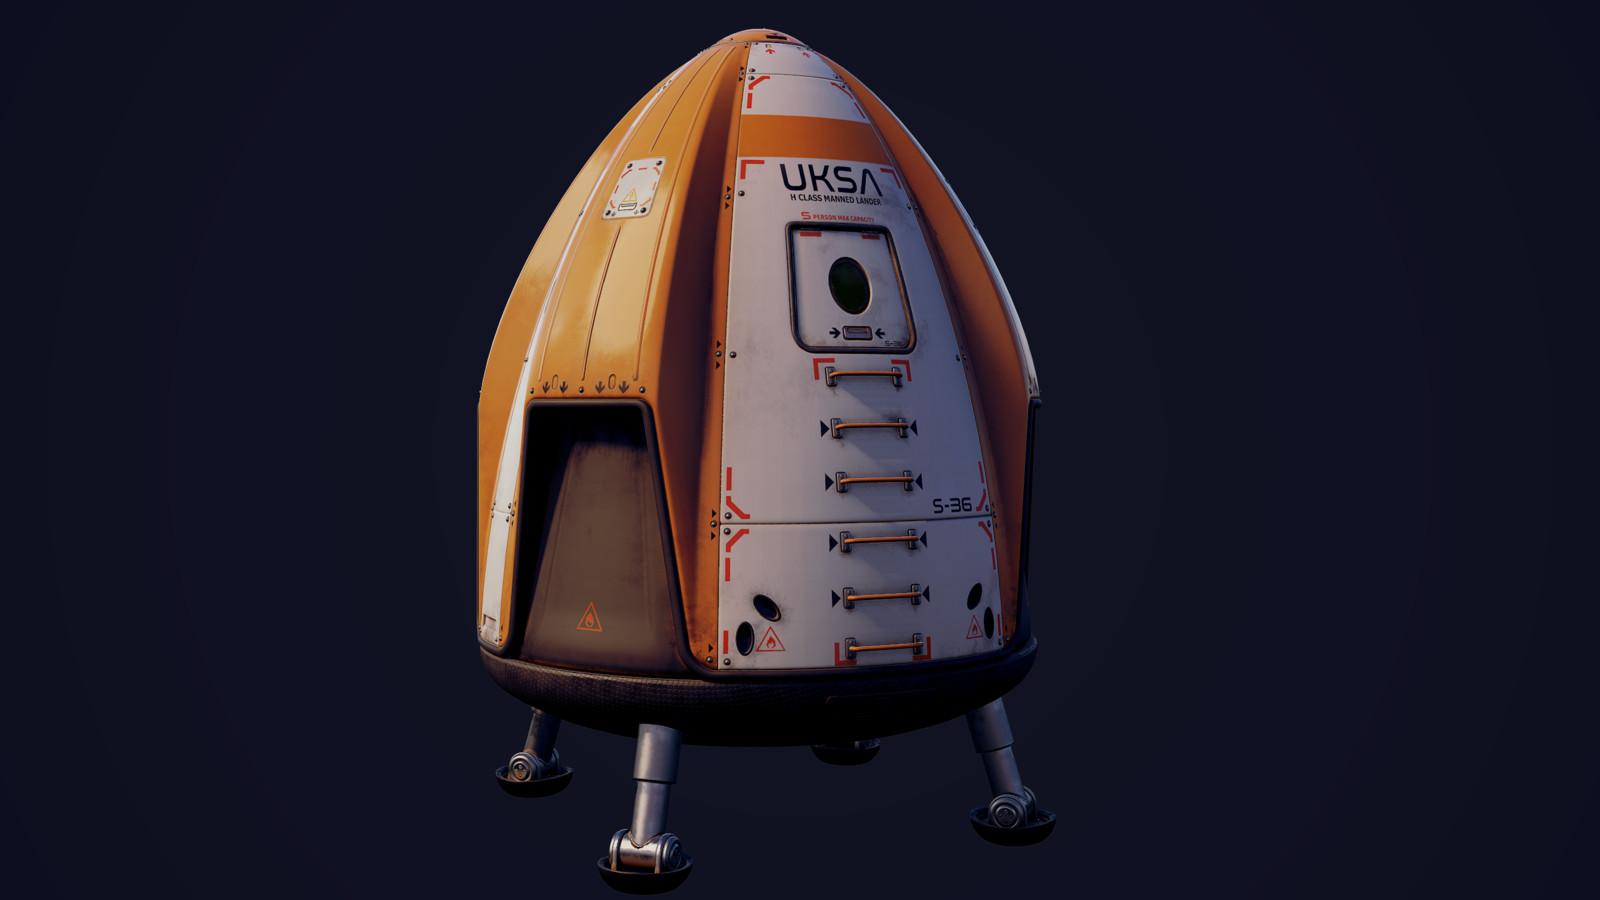 Asset - Manned Space Capsule/Lander